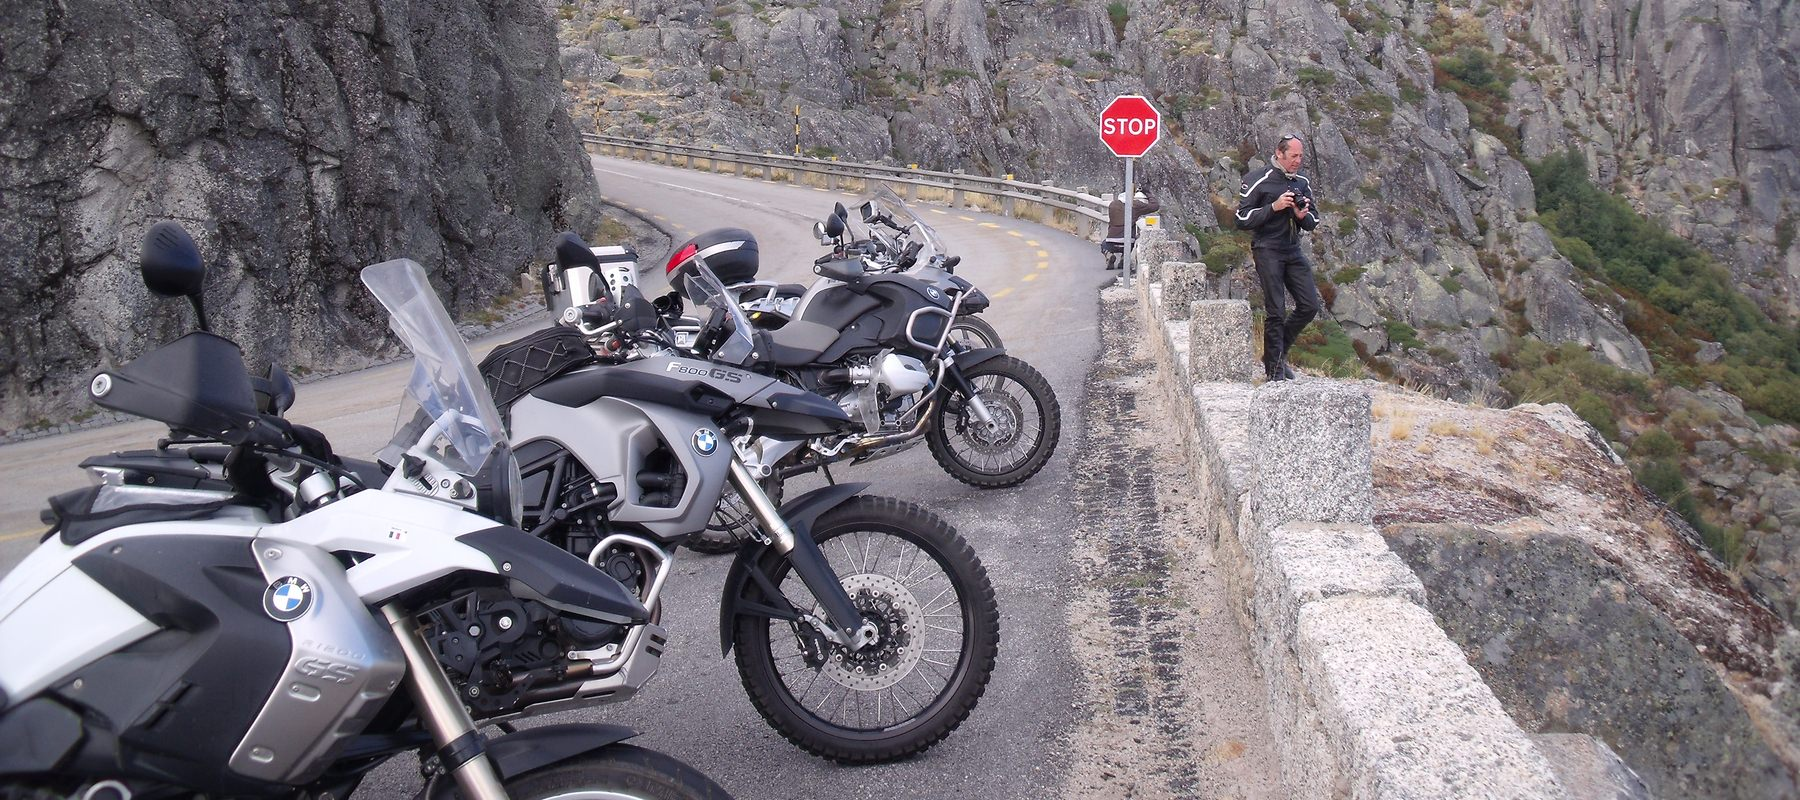 le grand tour du portugal libert moto west euro bikes. Black Bedroom Furniture Sets. Home Design Ideas